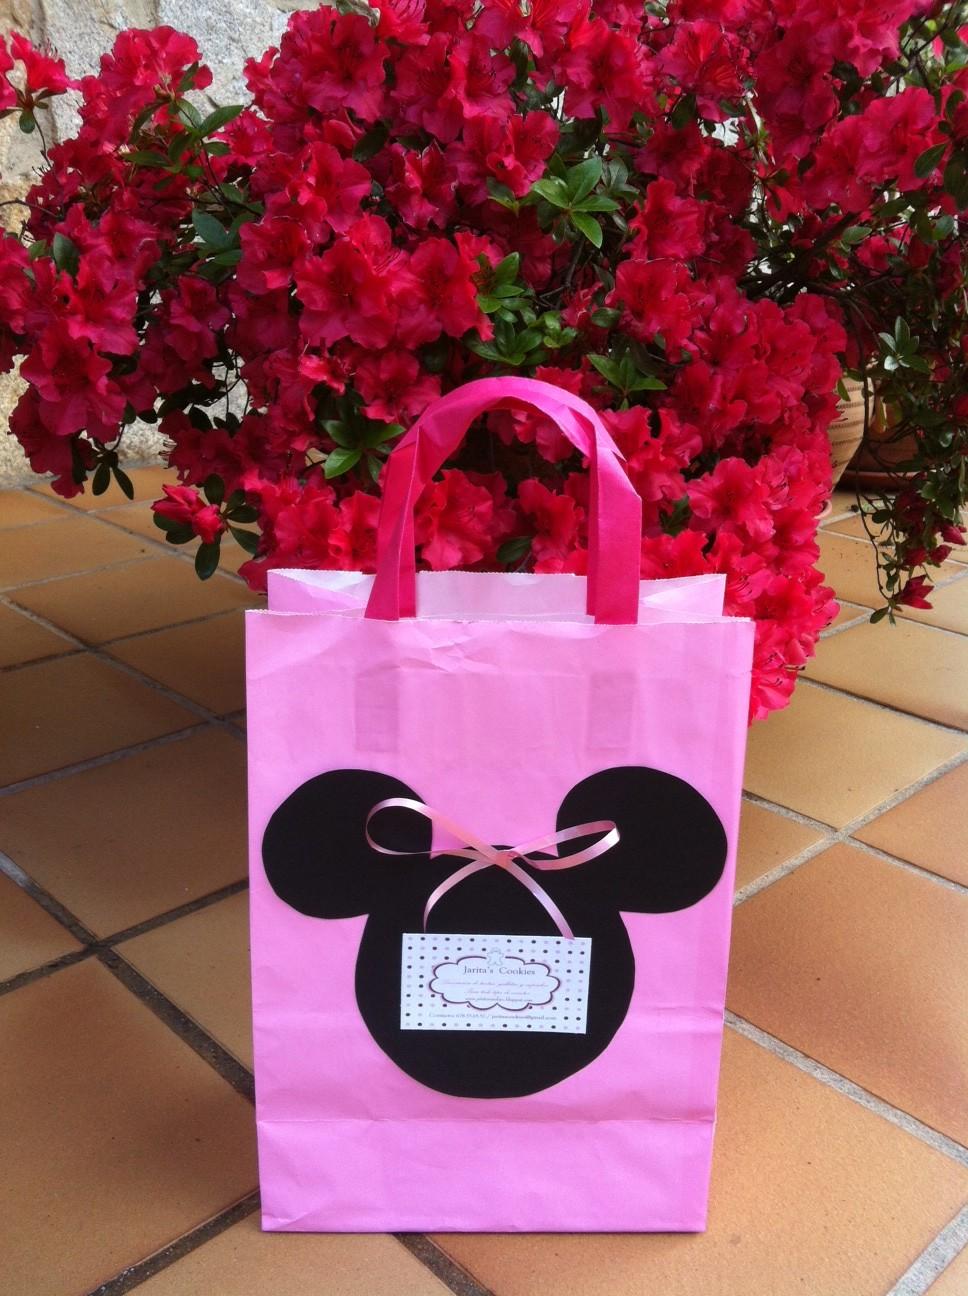 Jarita 39 s cookies tutorial bolsa minnie mouse - Como decorar bolsas de papel ...